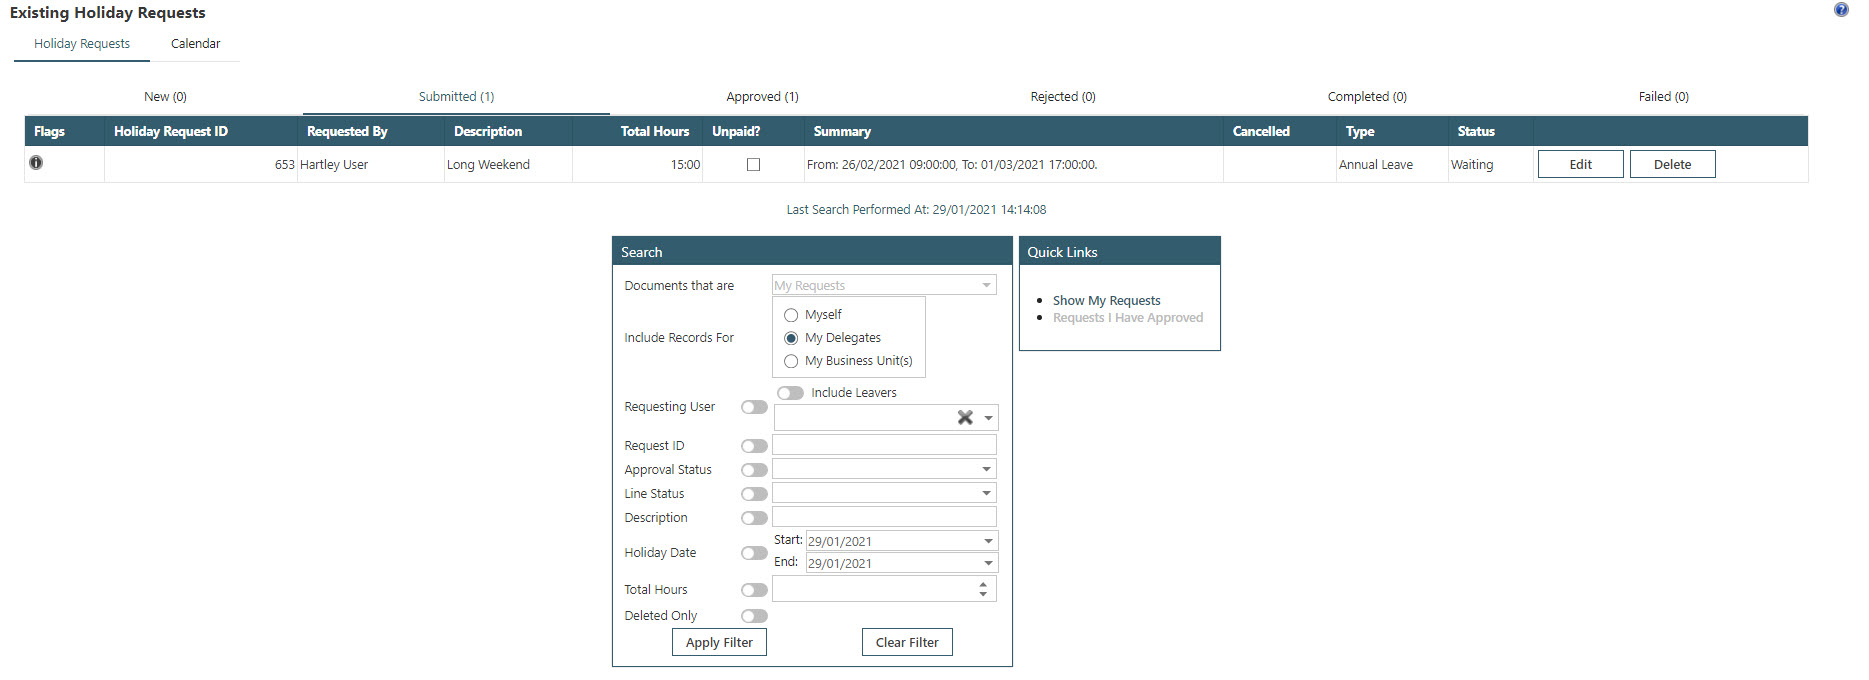 Sicon WAP Holidays Help and User Guide - WAP Holidays HUG Section 14 - Image 1